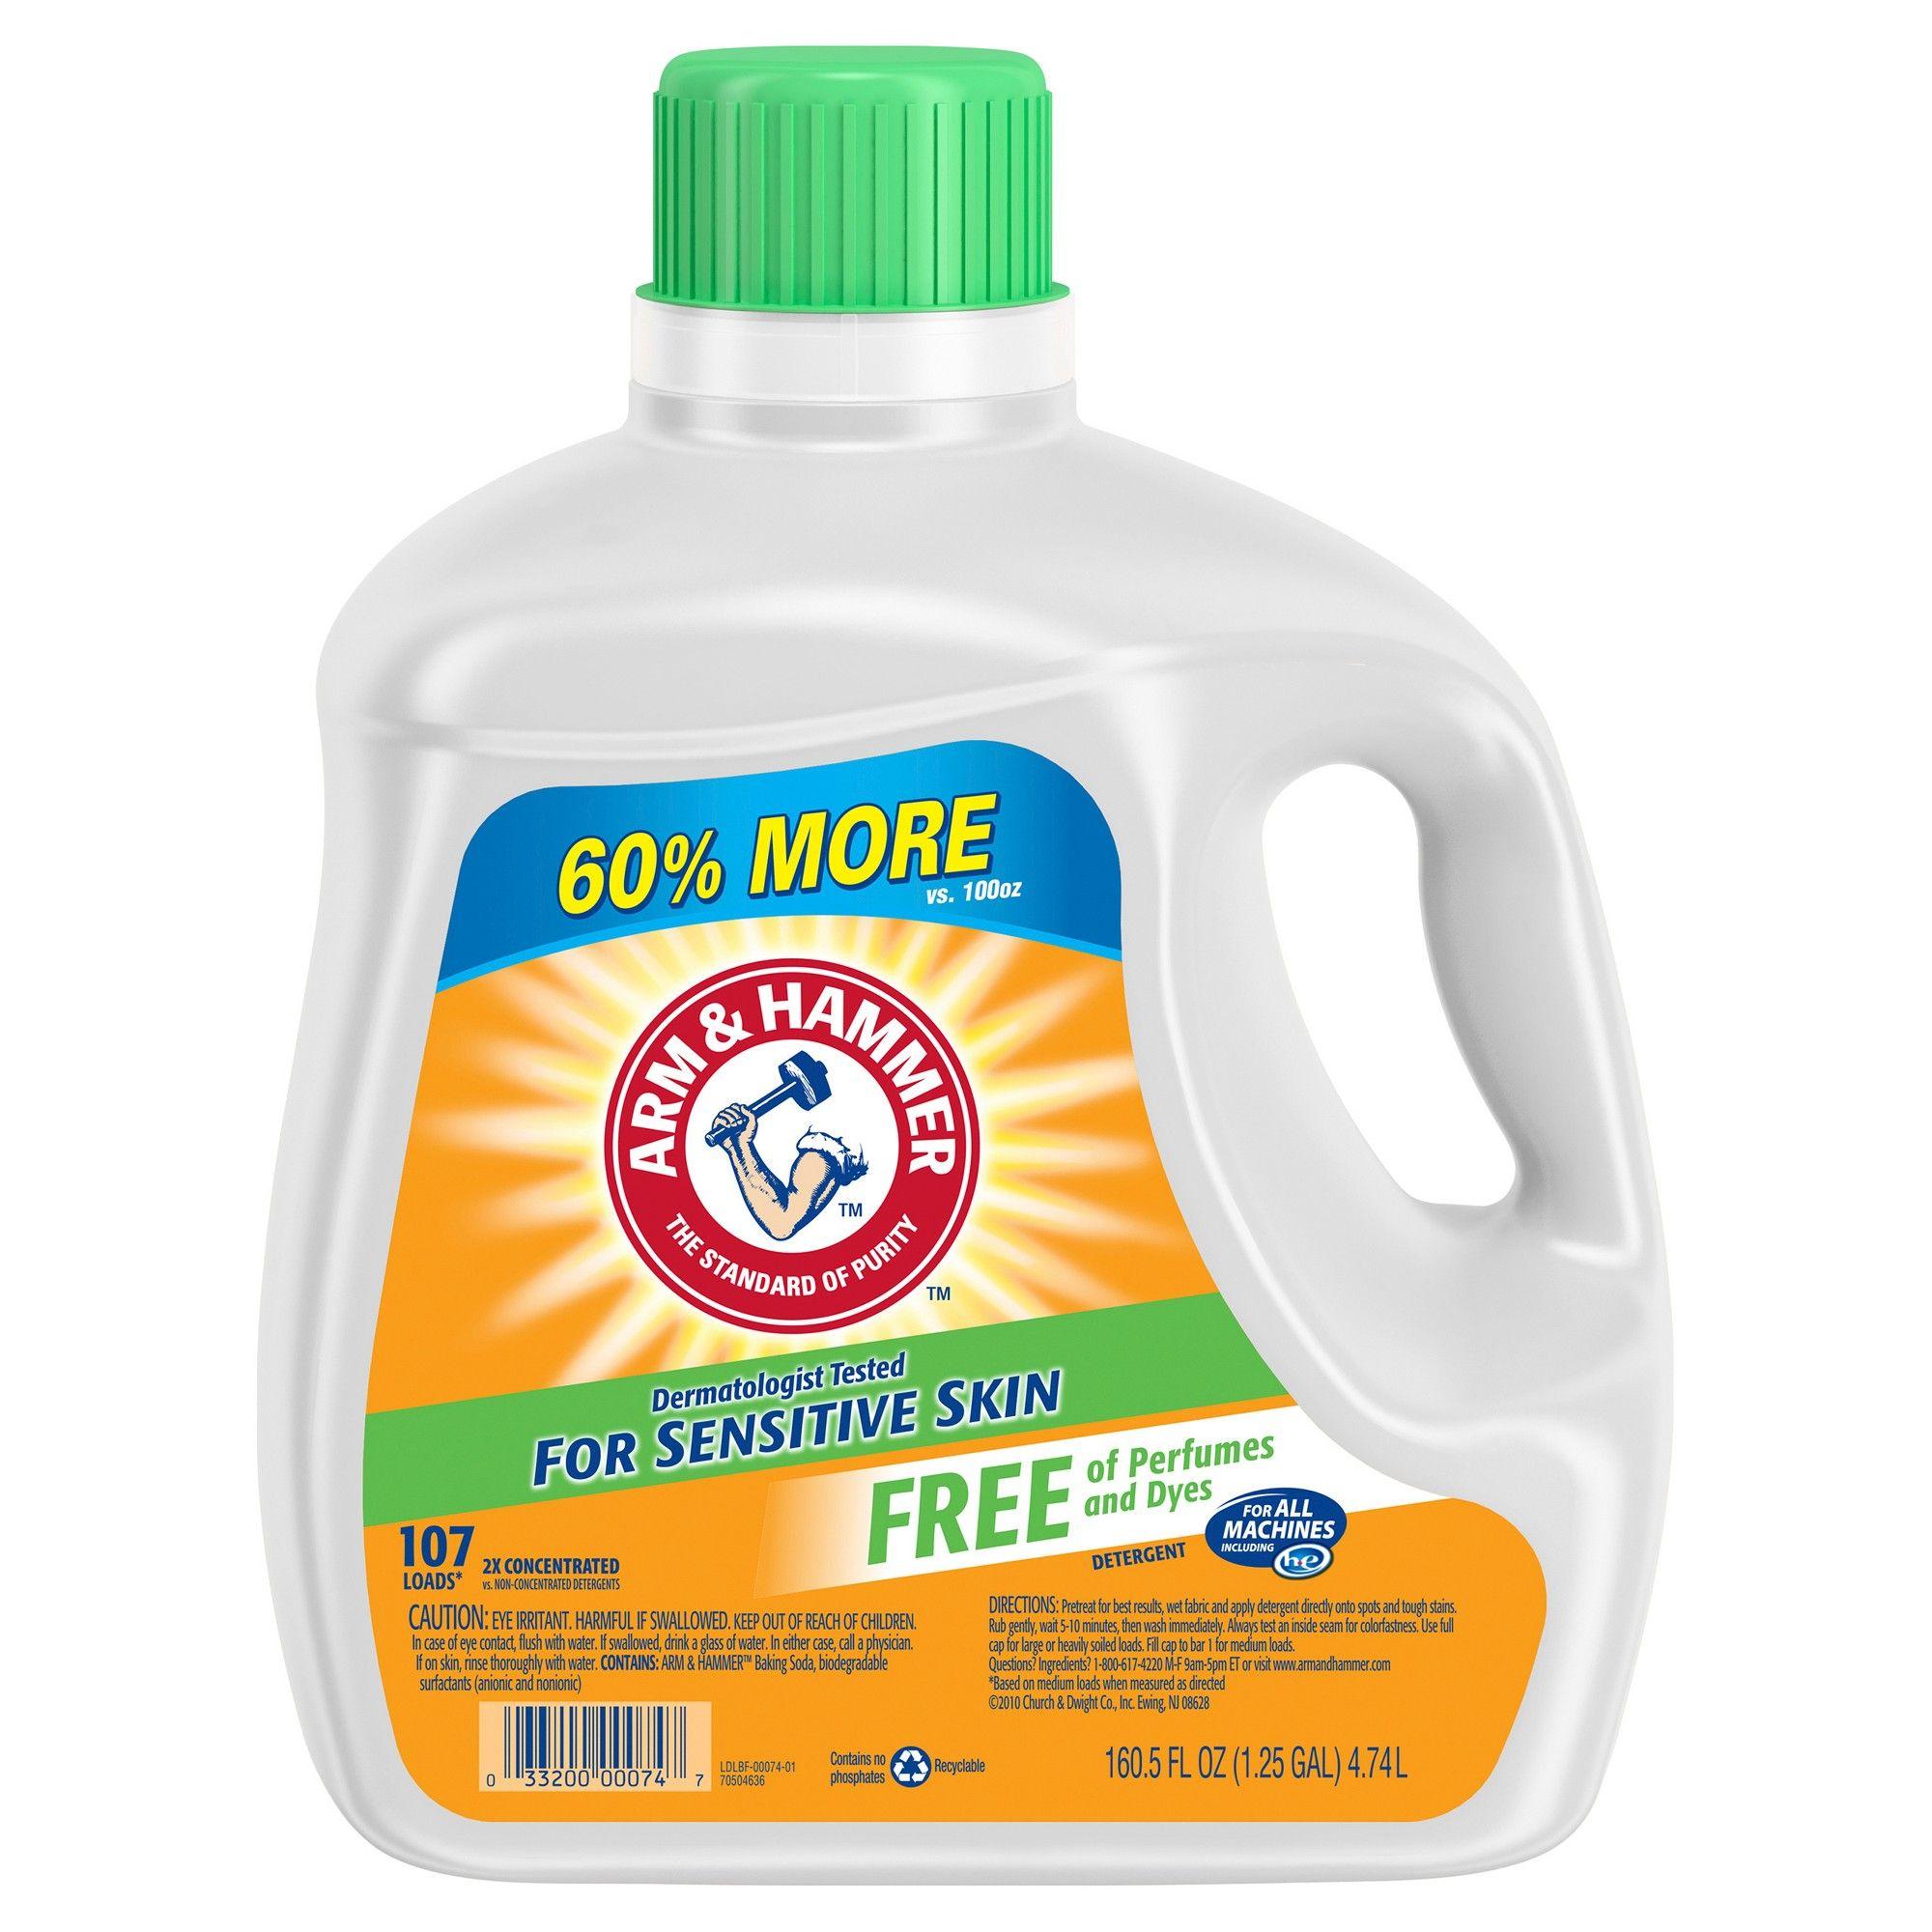 Arm Hammer Sensitive Free Clear Liquid Laundry Detergent